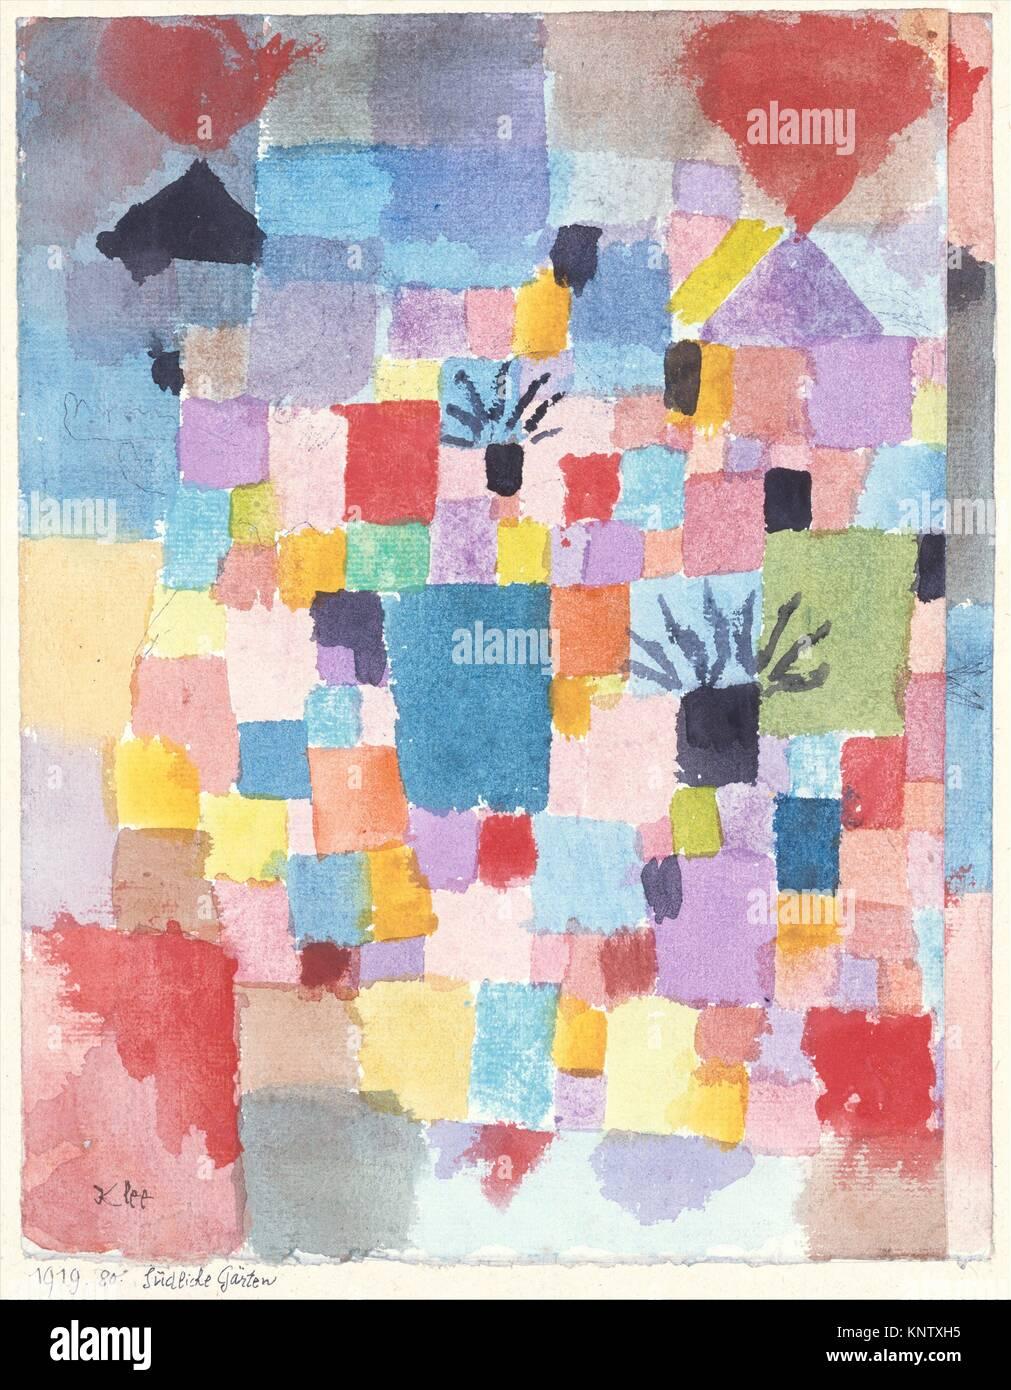 Southern Gardens. Artist: Paul Klee (German (born Switzerland), Münchenbuchsee 1879-1940 Muralto-Locarno); - Stock Image